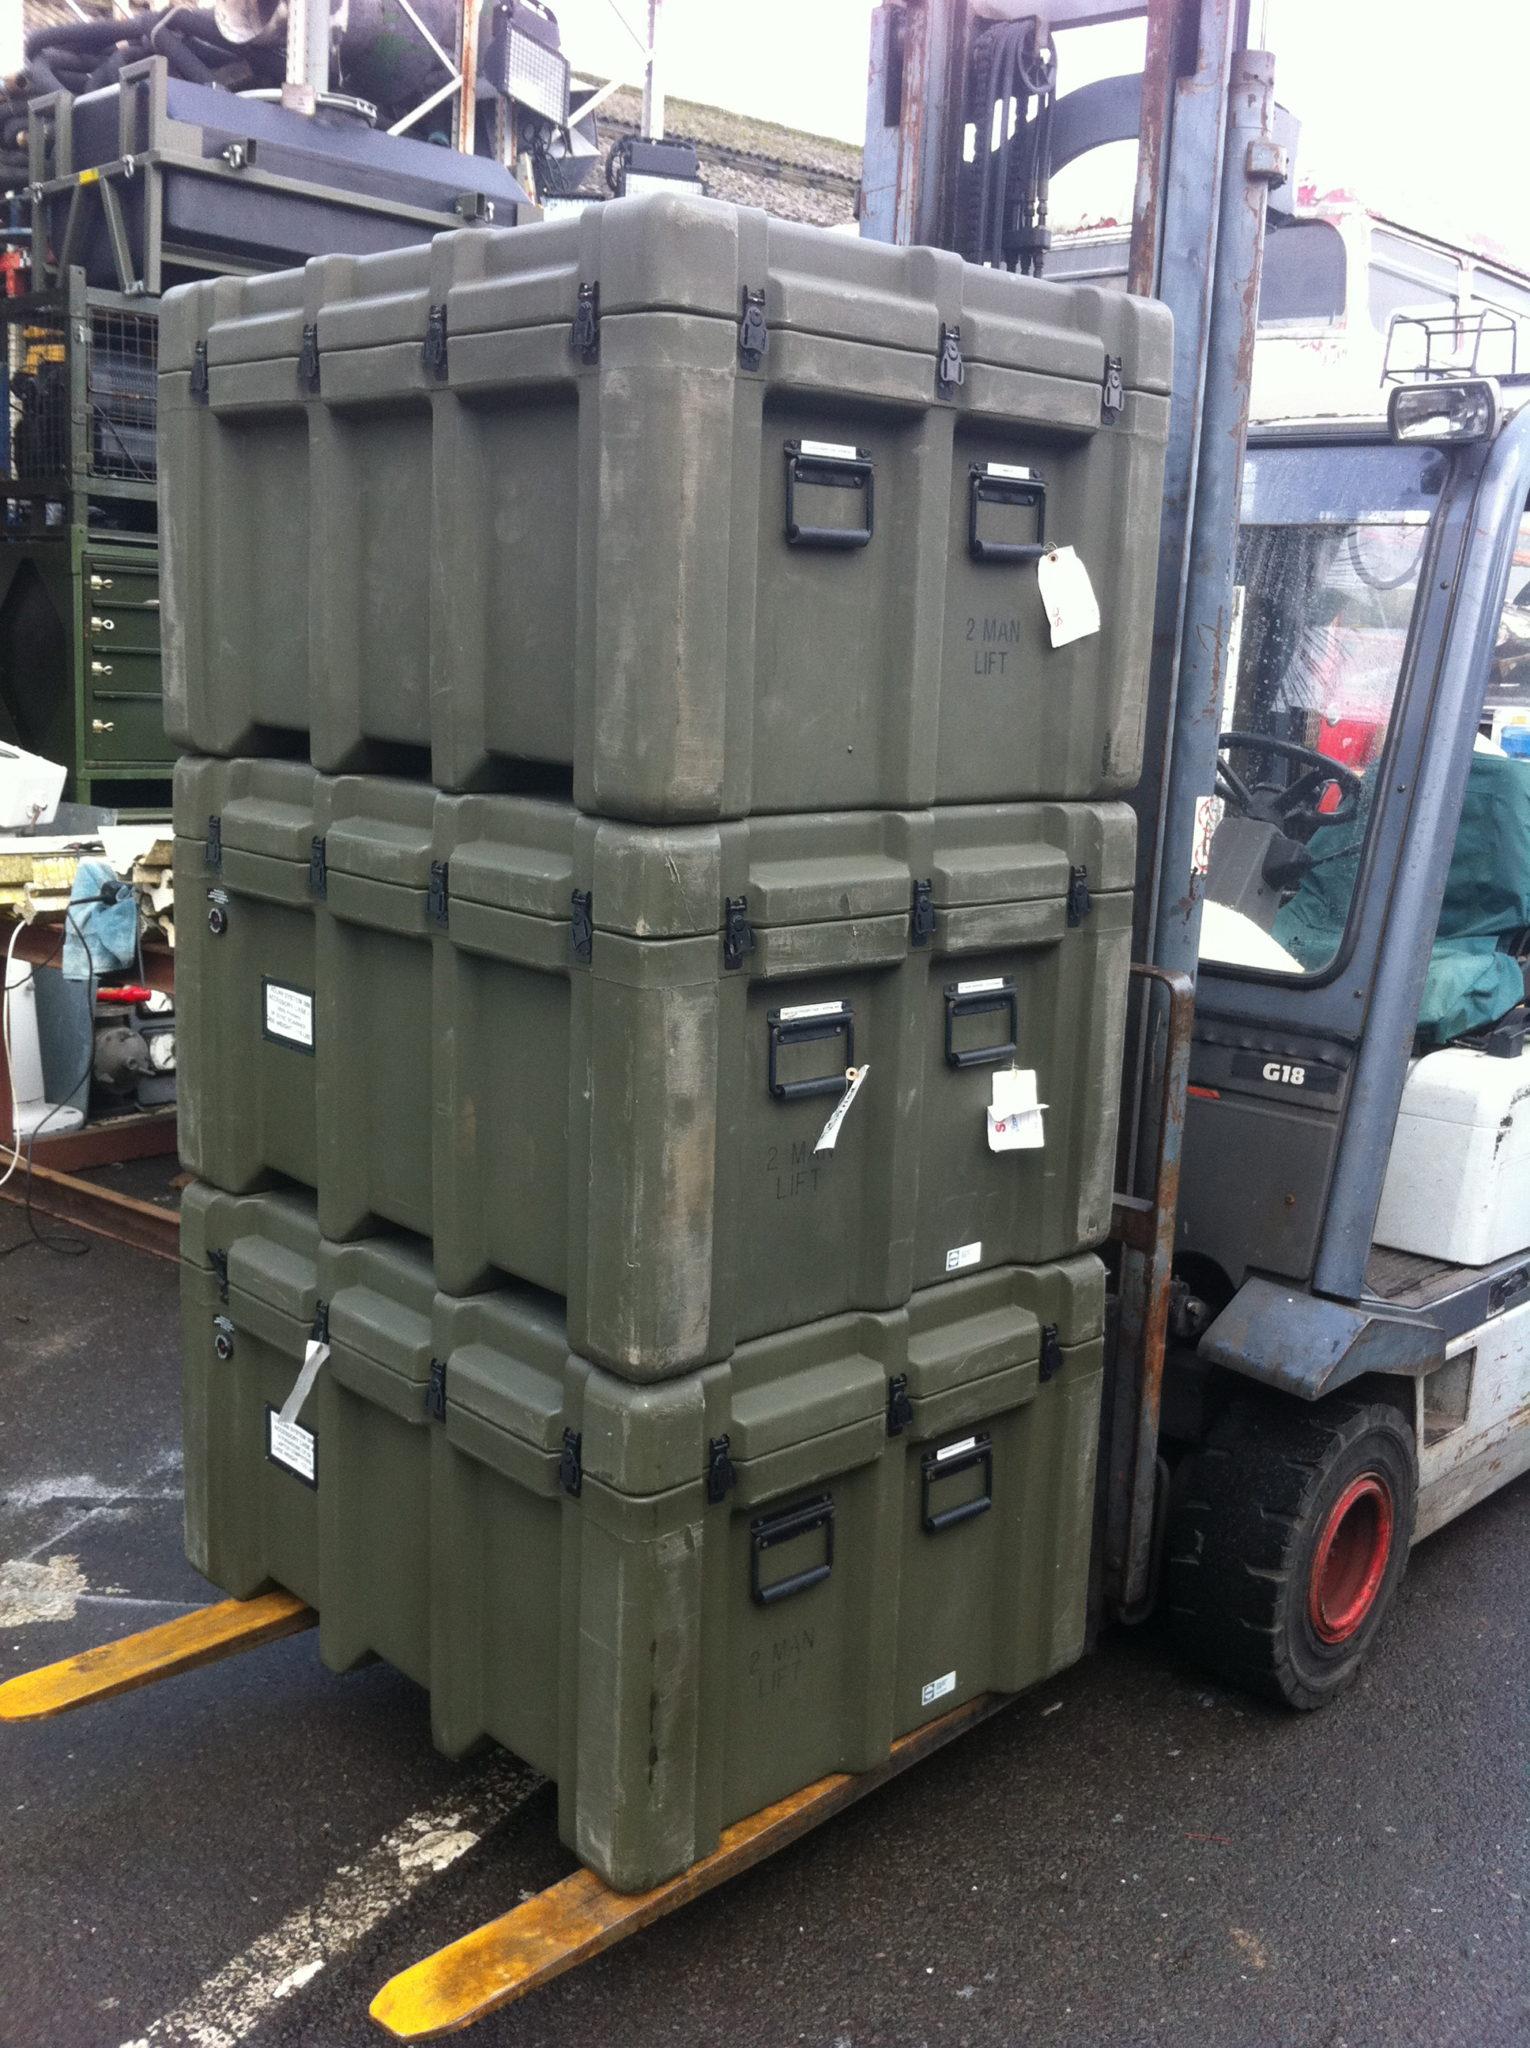 Large Transit Cases - Large Transit Case 5 Available